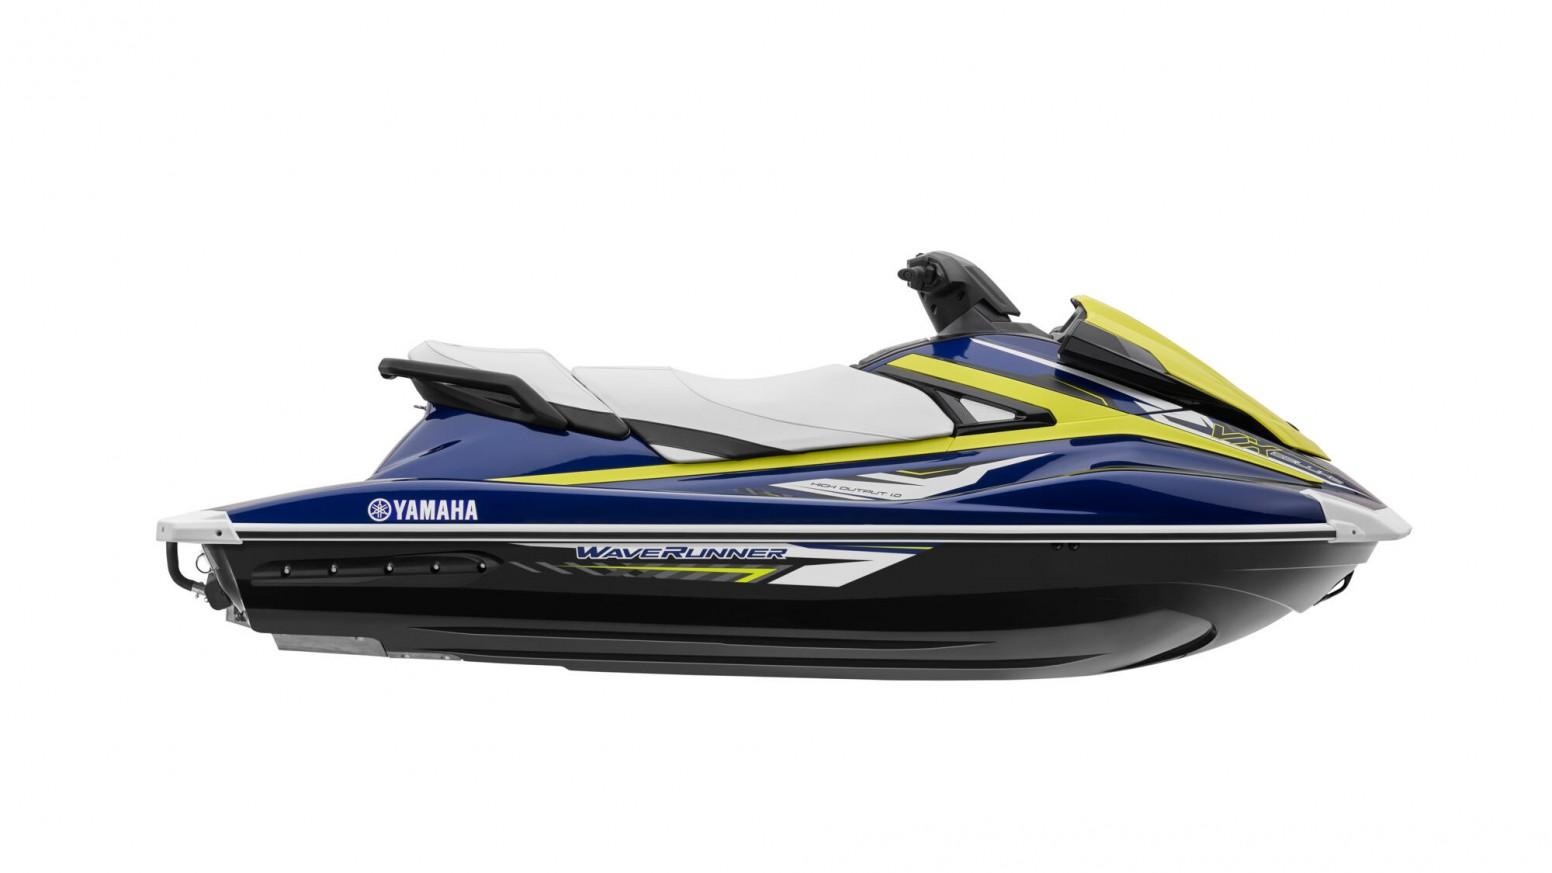 Джет ски Yamaha Waverunner VX Deluxe 2020 BoatsBG